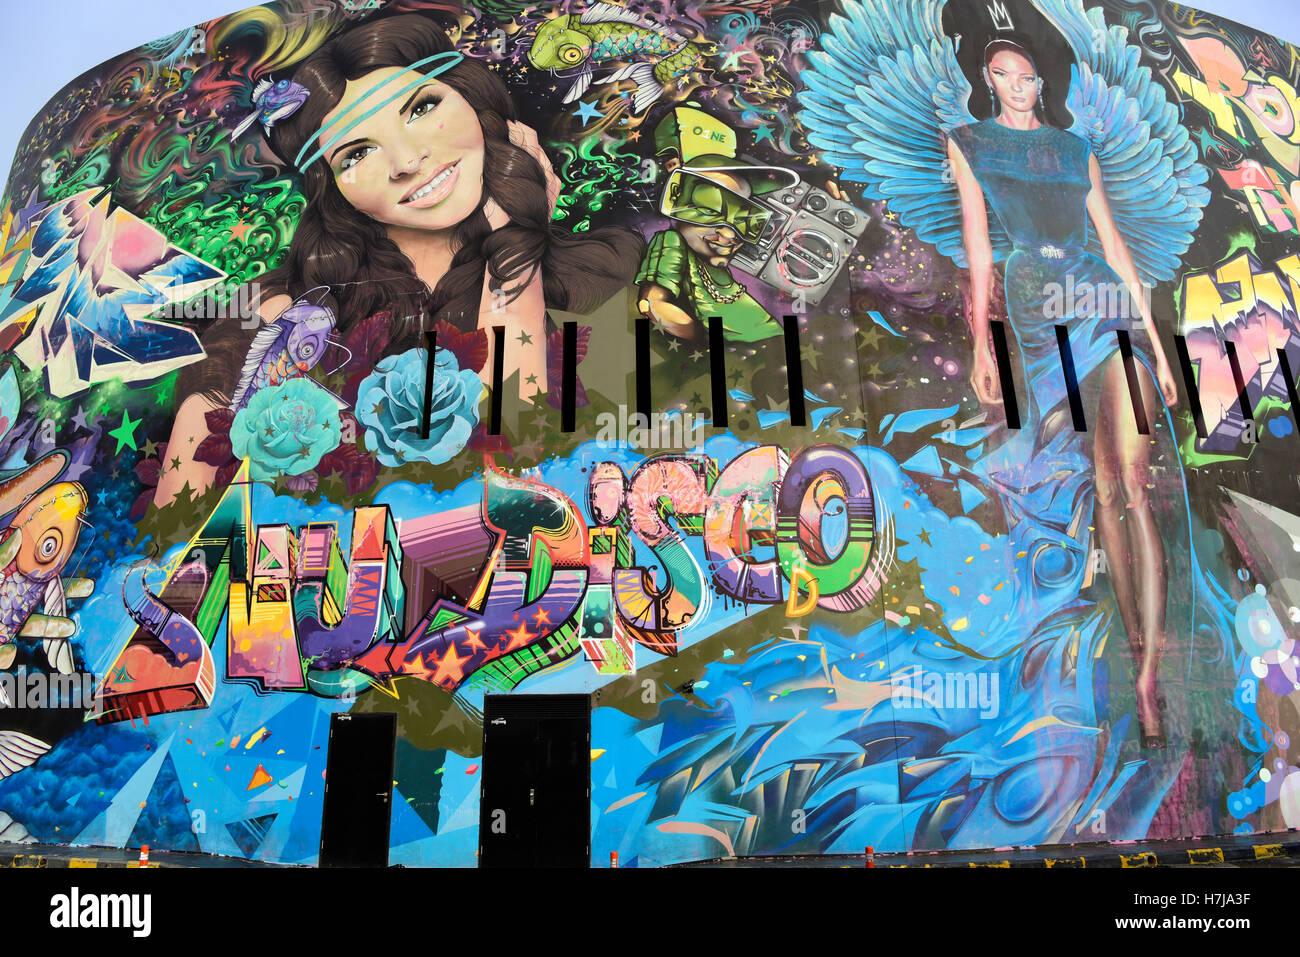 Graffiti adornado O1NE, el mar, la discoteca de Beirut Beirut, Líbano. Imagen De Stock